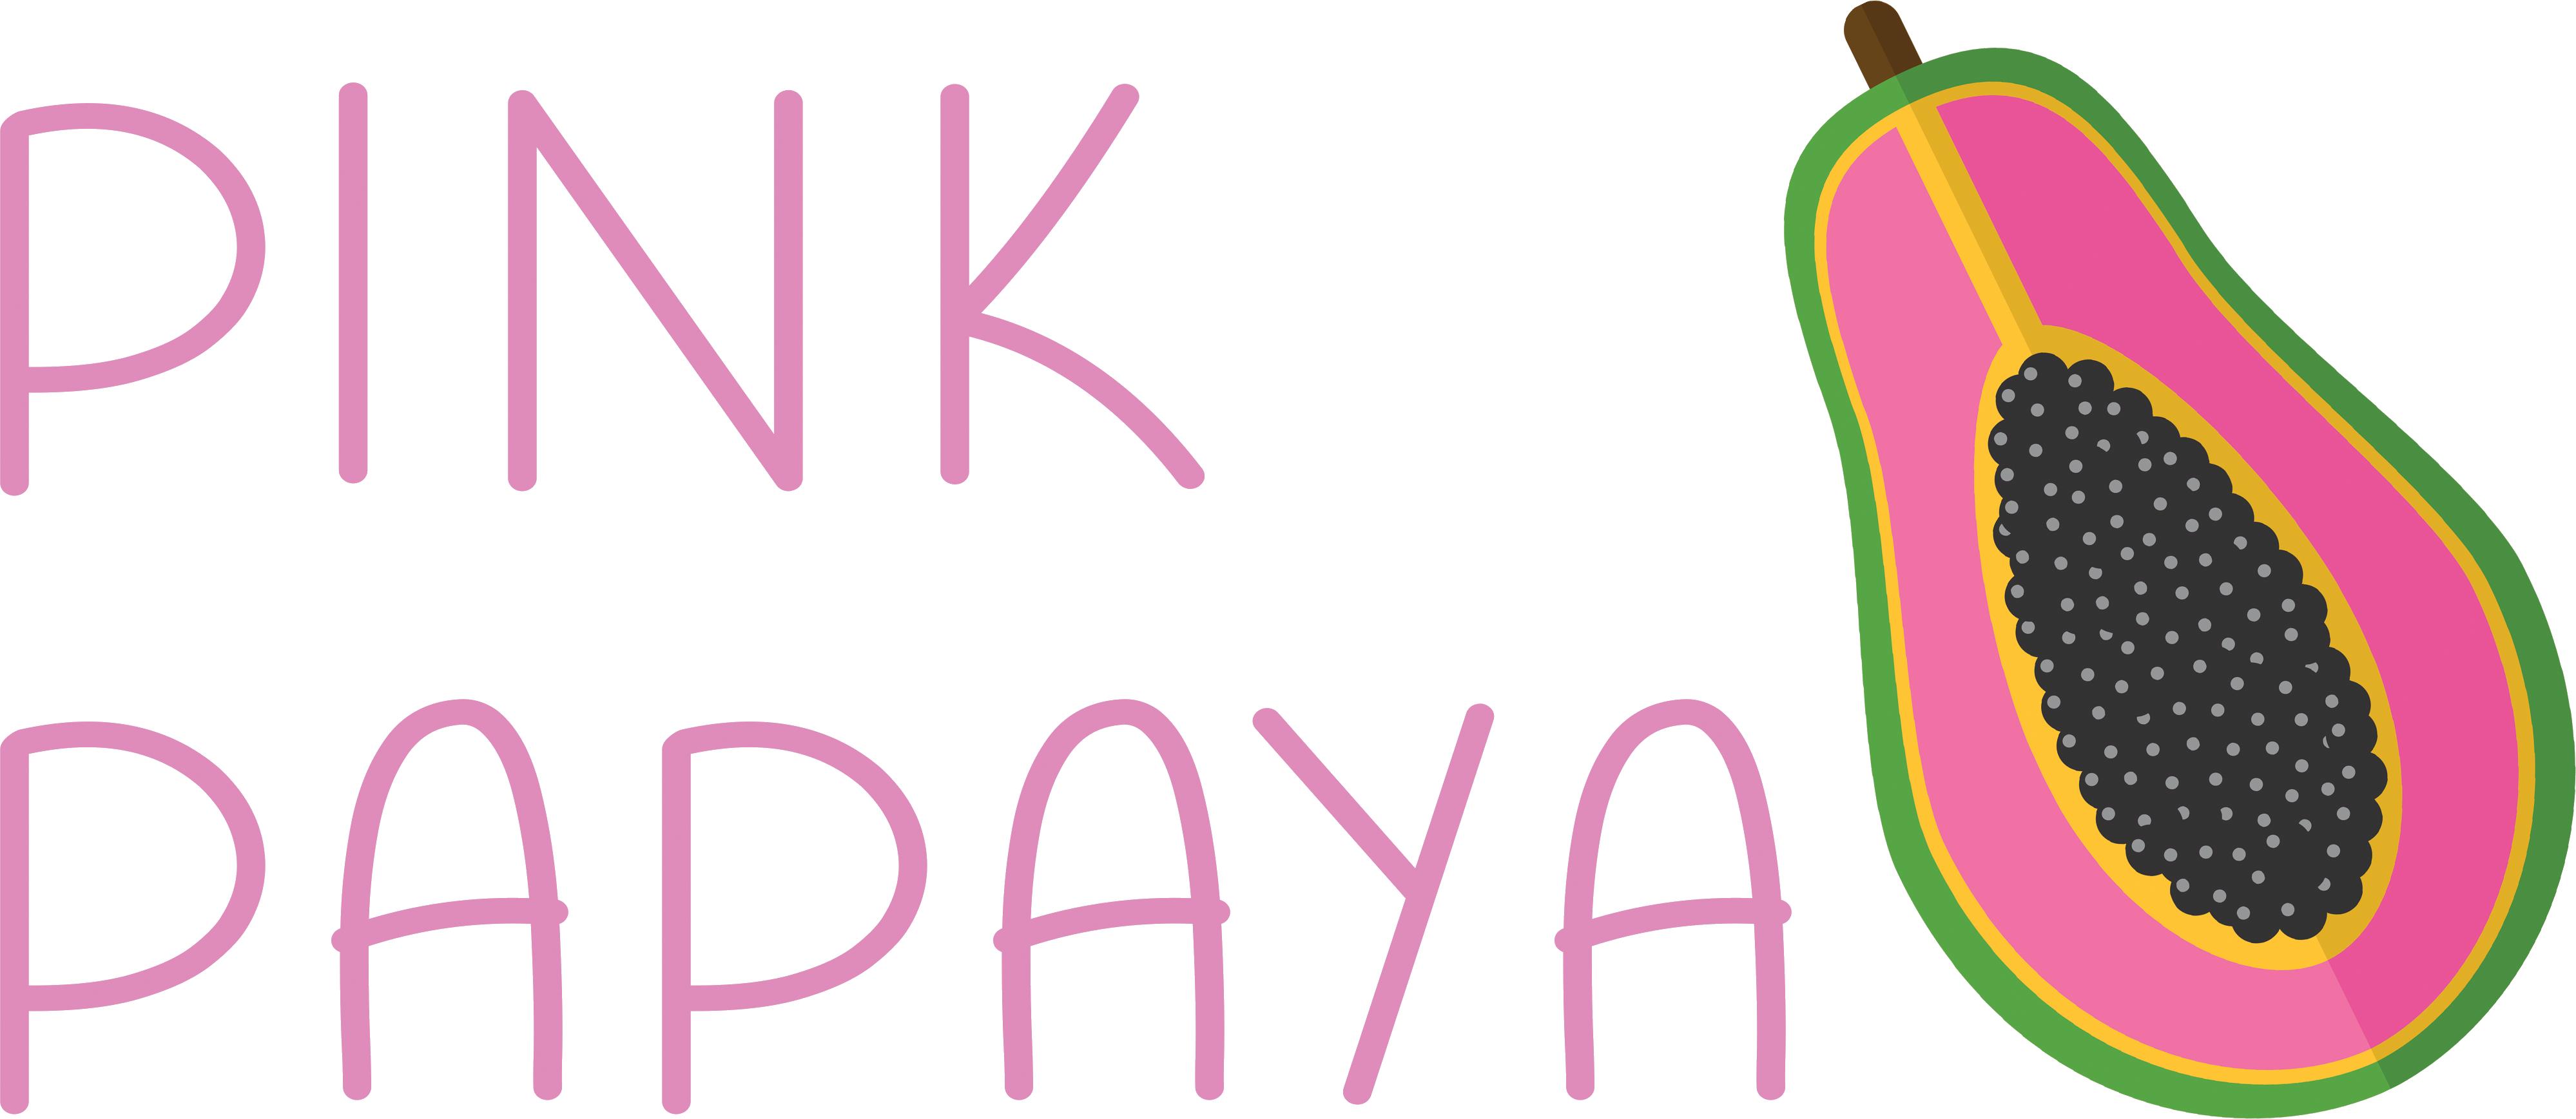 Pink Papaya Brand